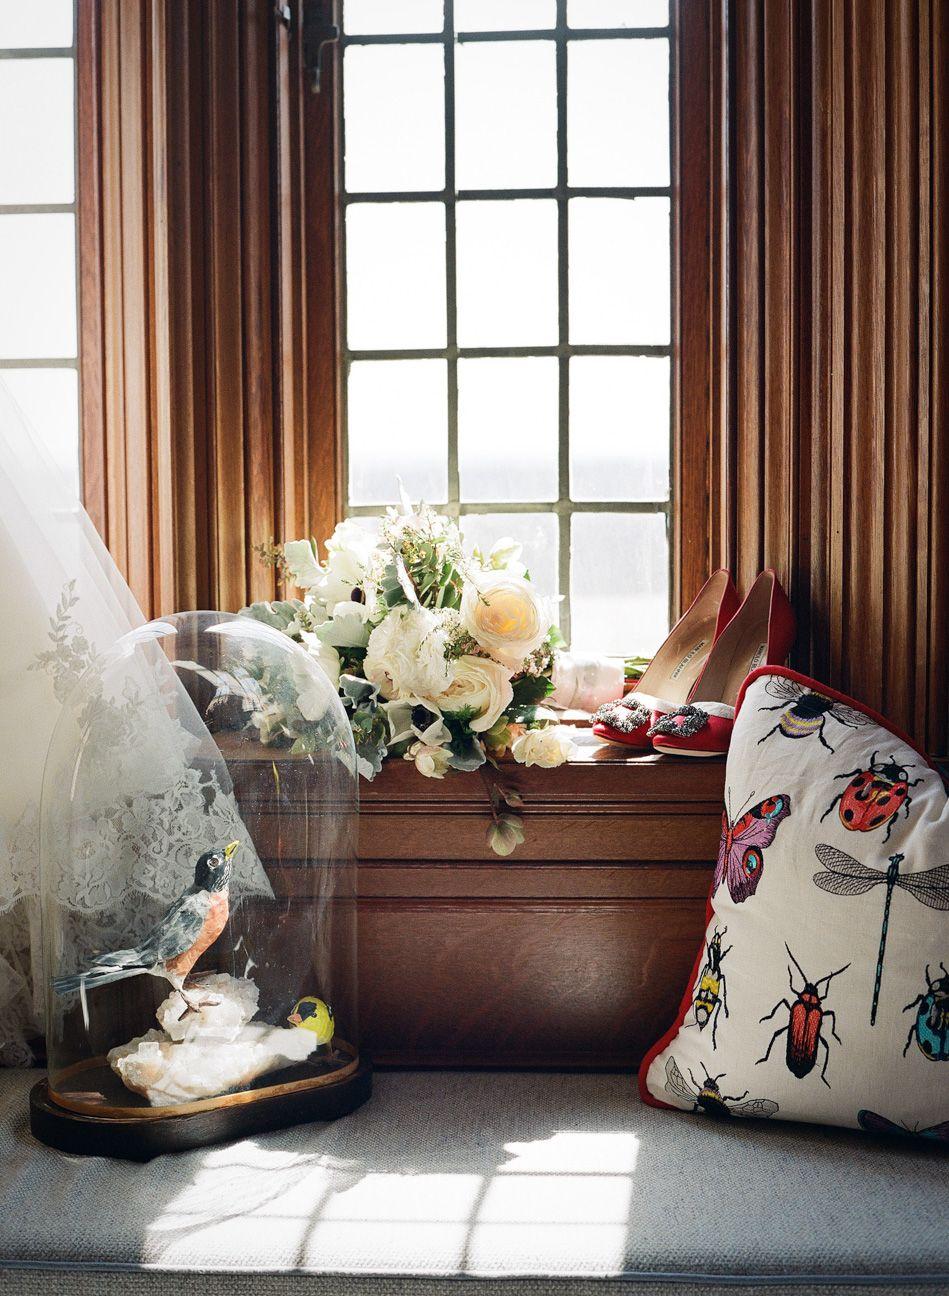 KarenHillPhotography-Zhu-Wedding-0038.jpg